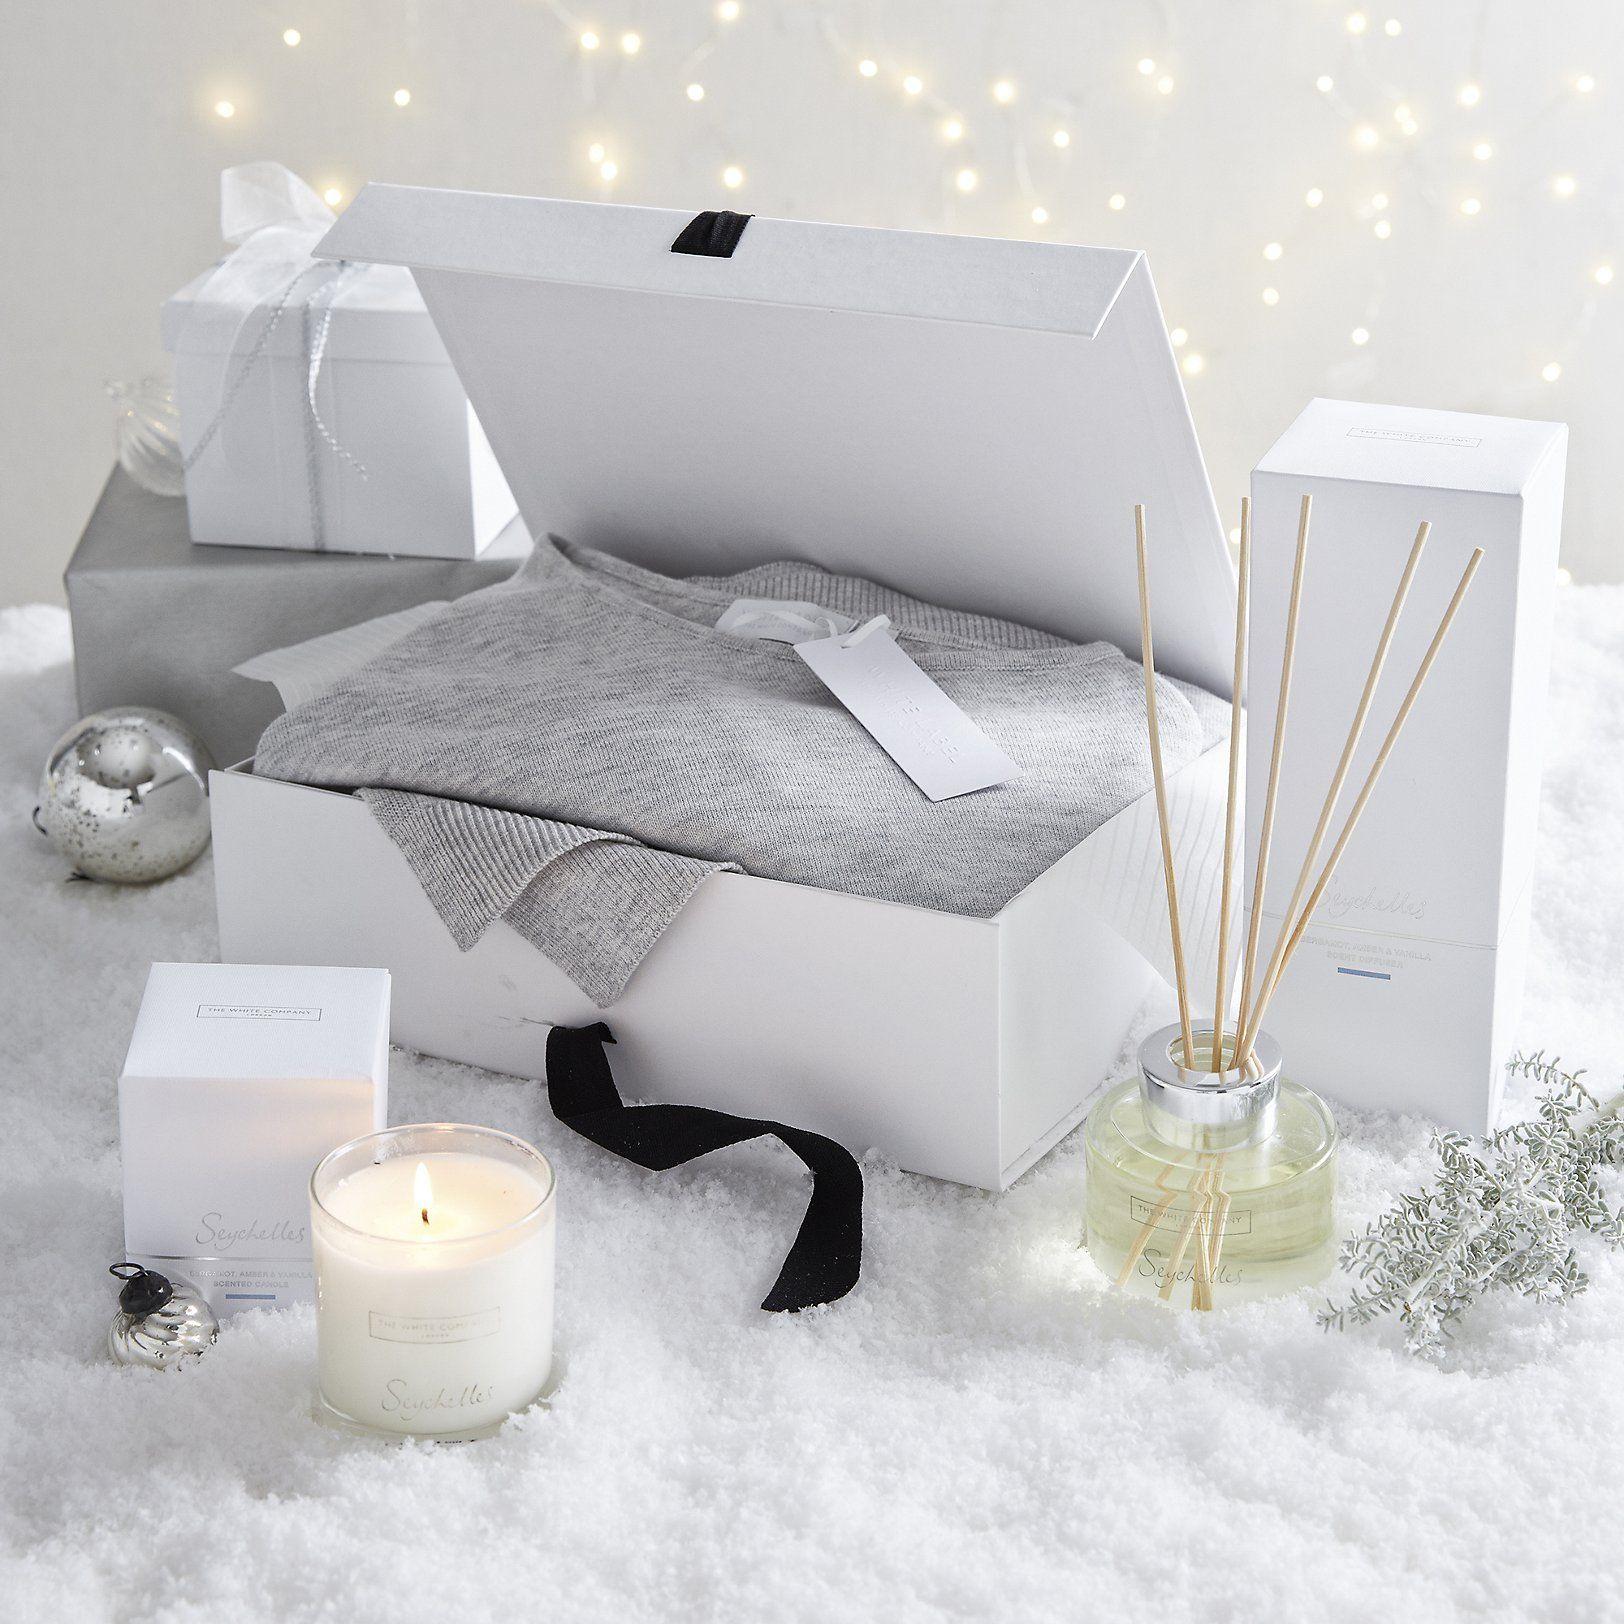 Interior design home fragrance gift set - Ladies Indulgence Gift Hamper Gift Sets Candles Fragrance The White Company Uk